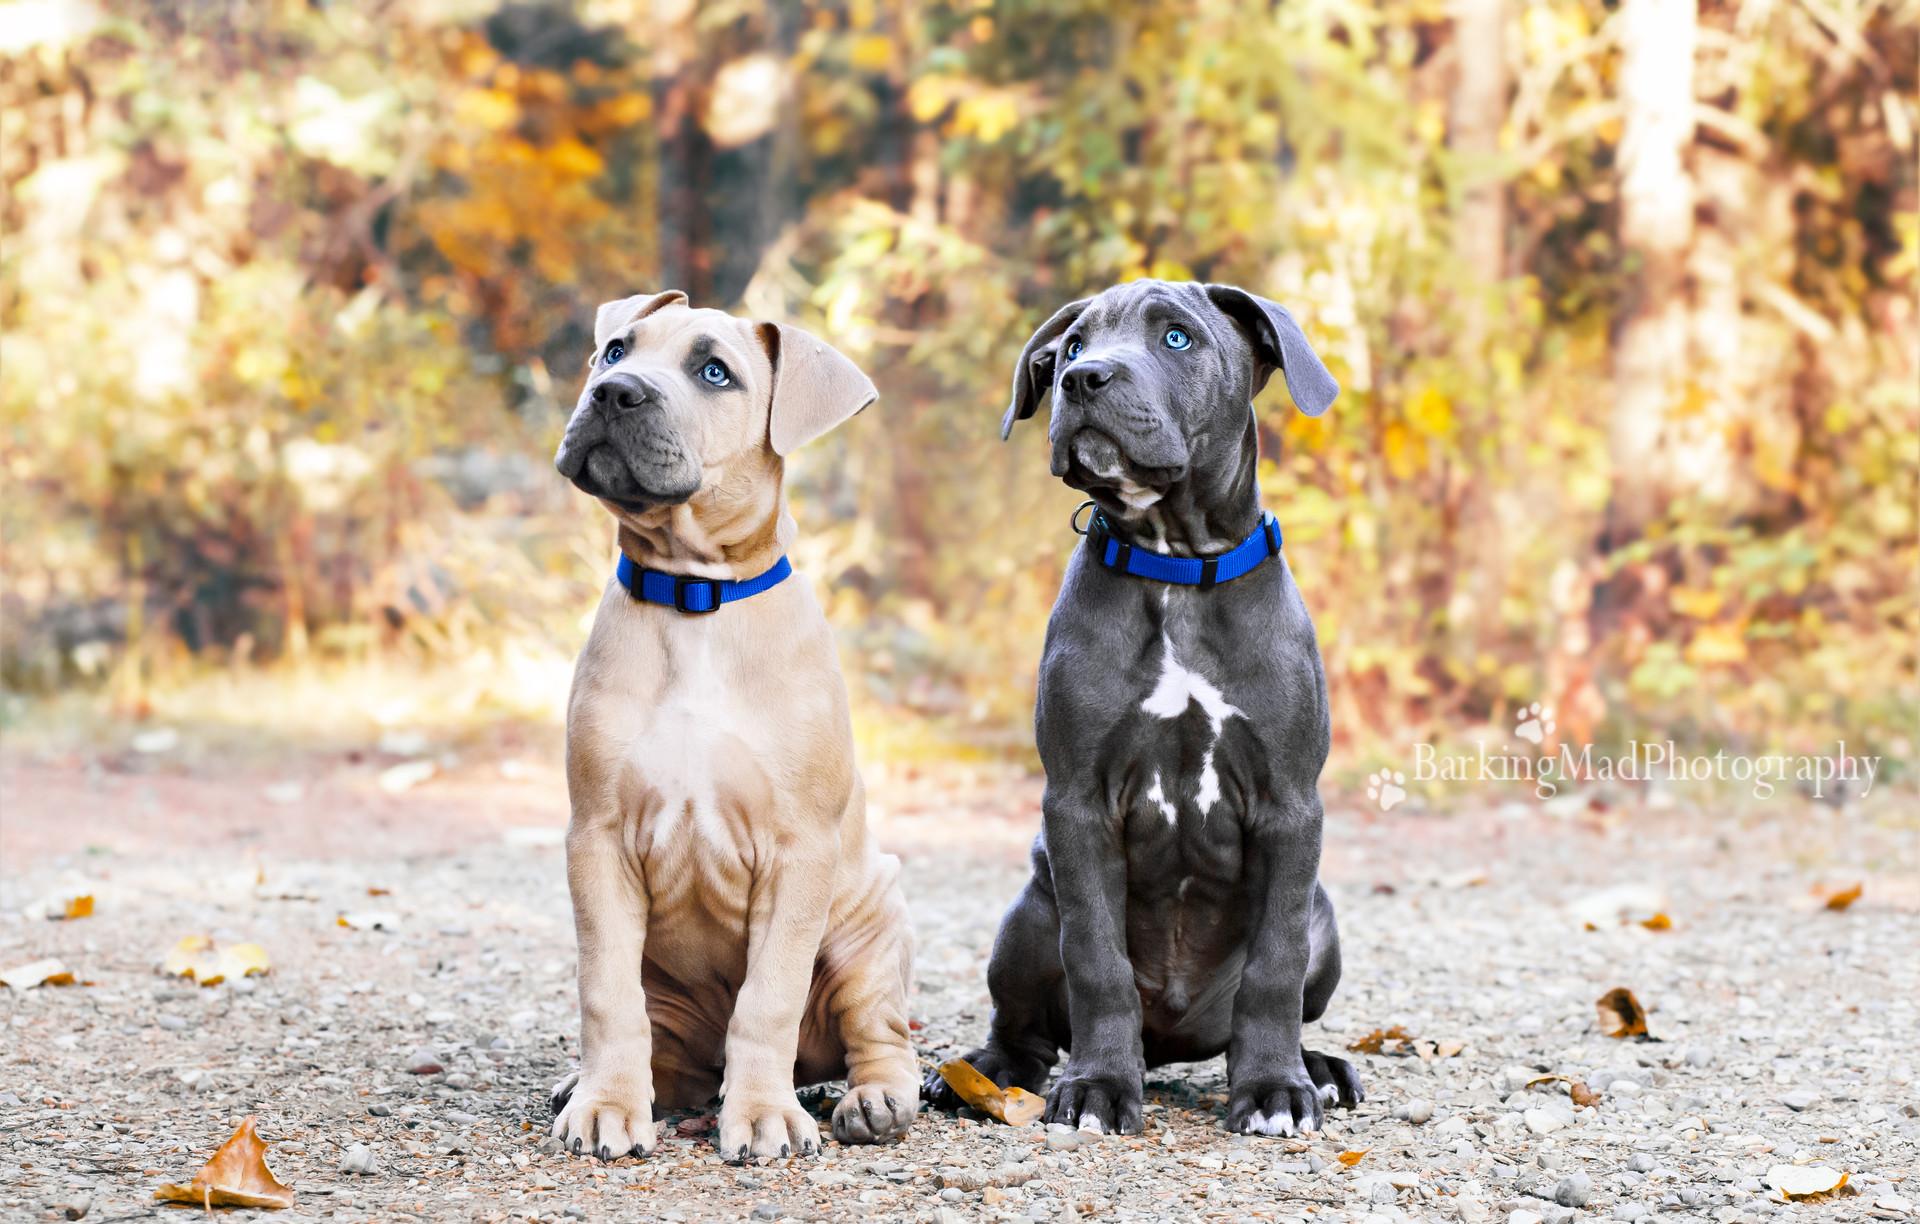 Brutus and Briggs